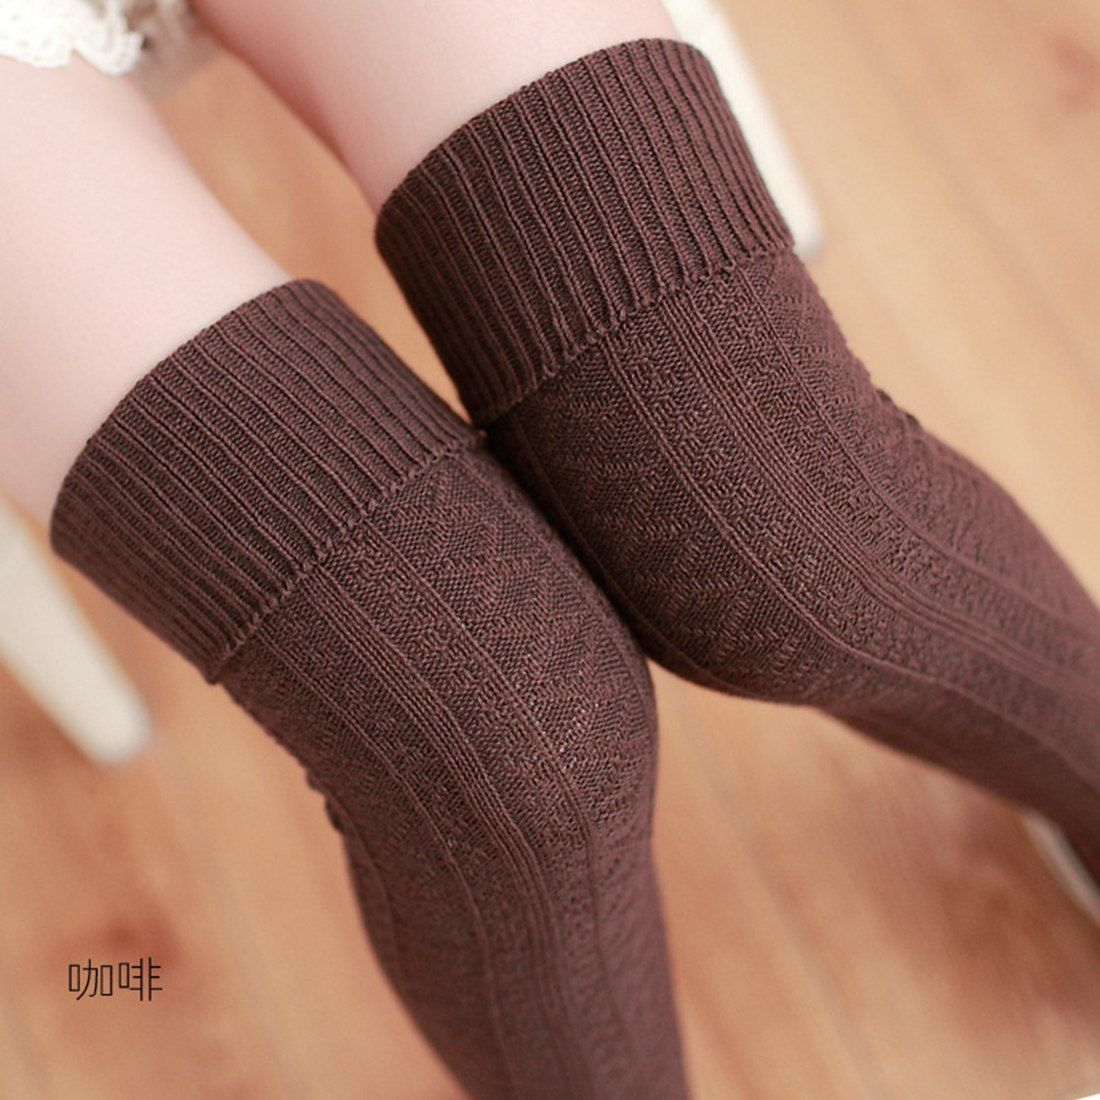 afb92ba03 Beige Brown Red Gray Black Knee Socks Women Warm Thigh High Stockings  Stocking 2017 Fashion Sexy